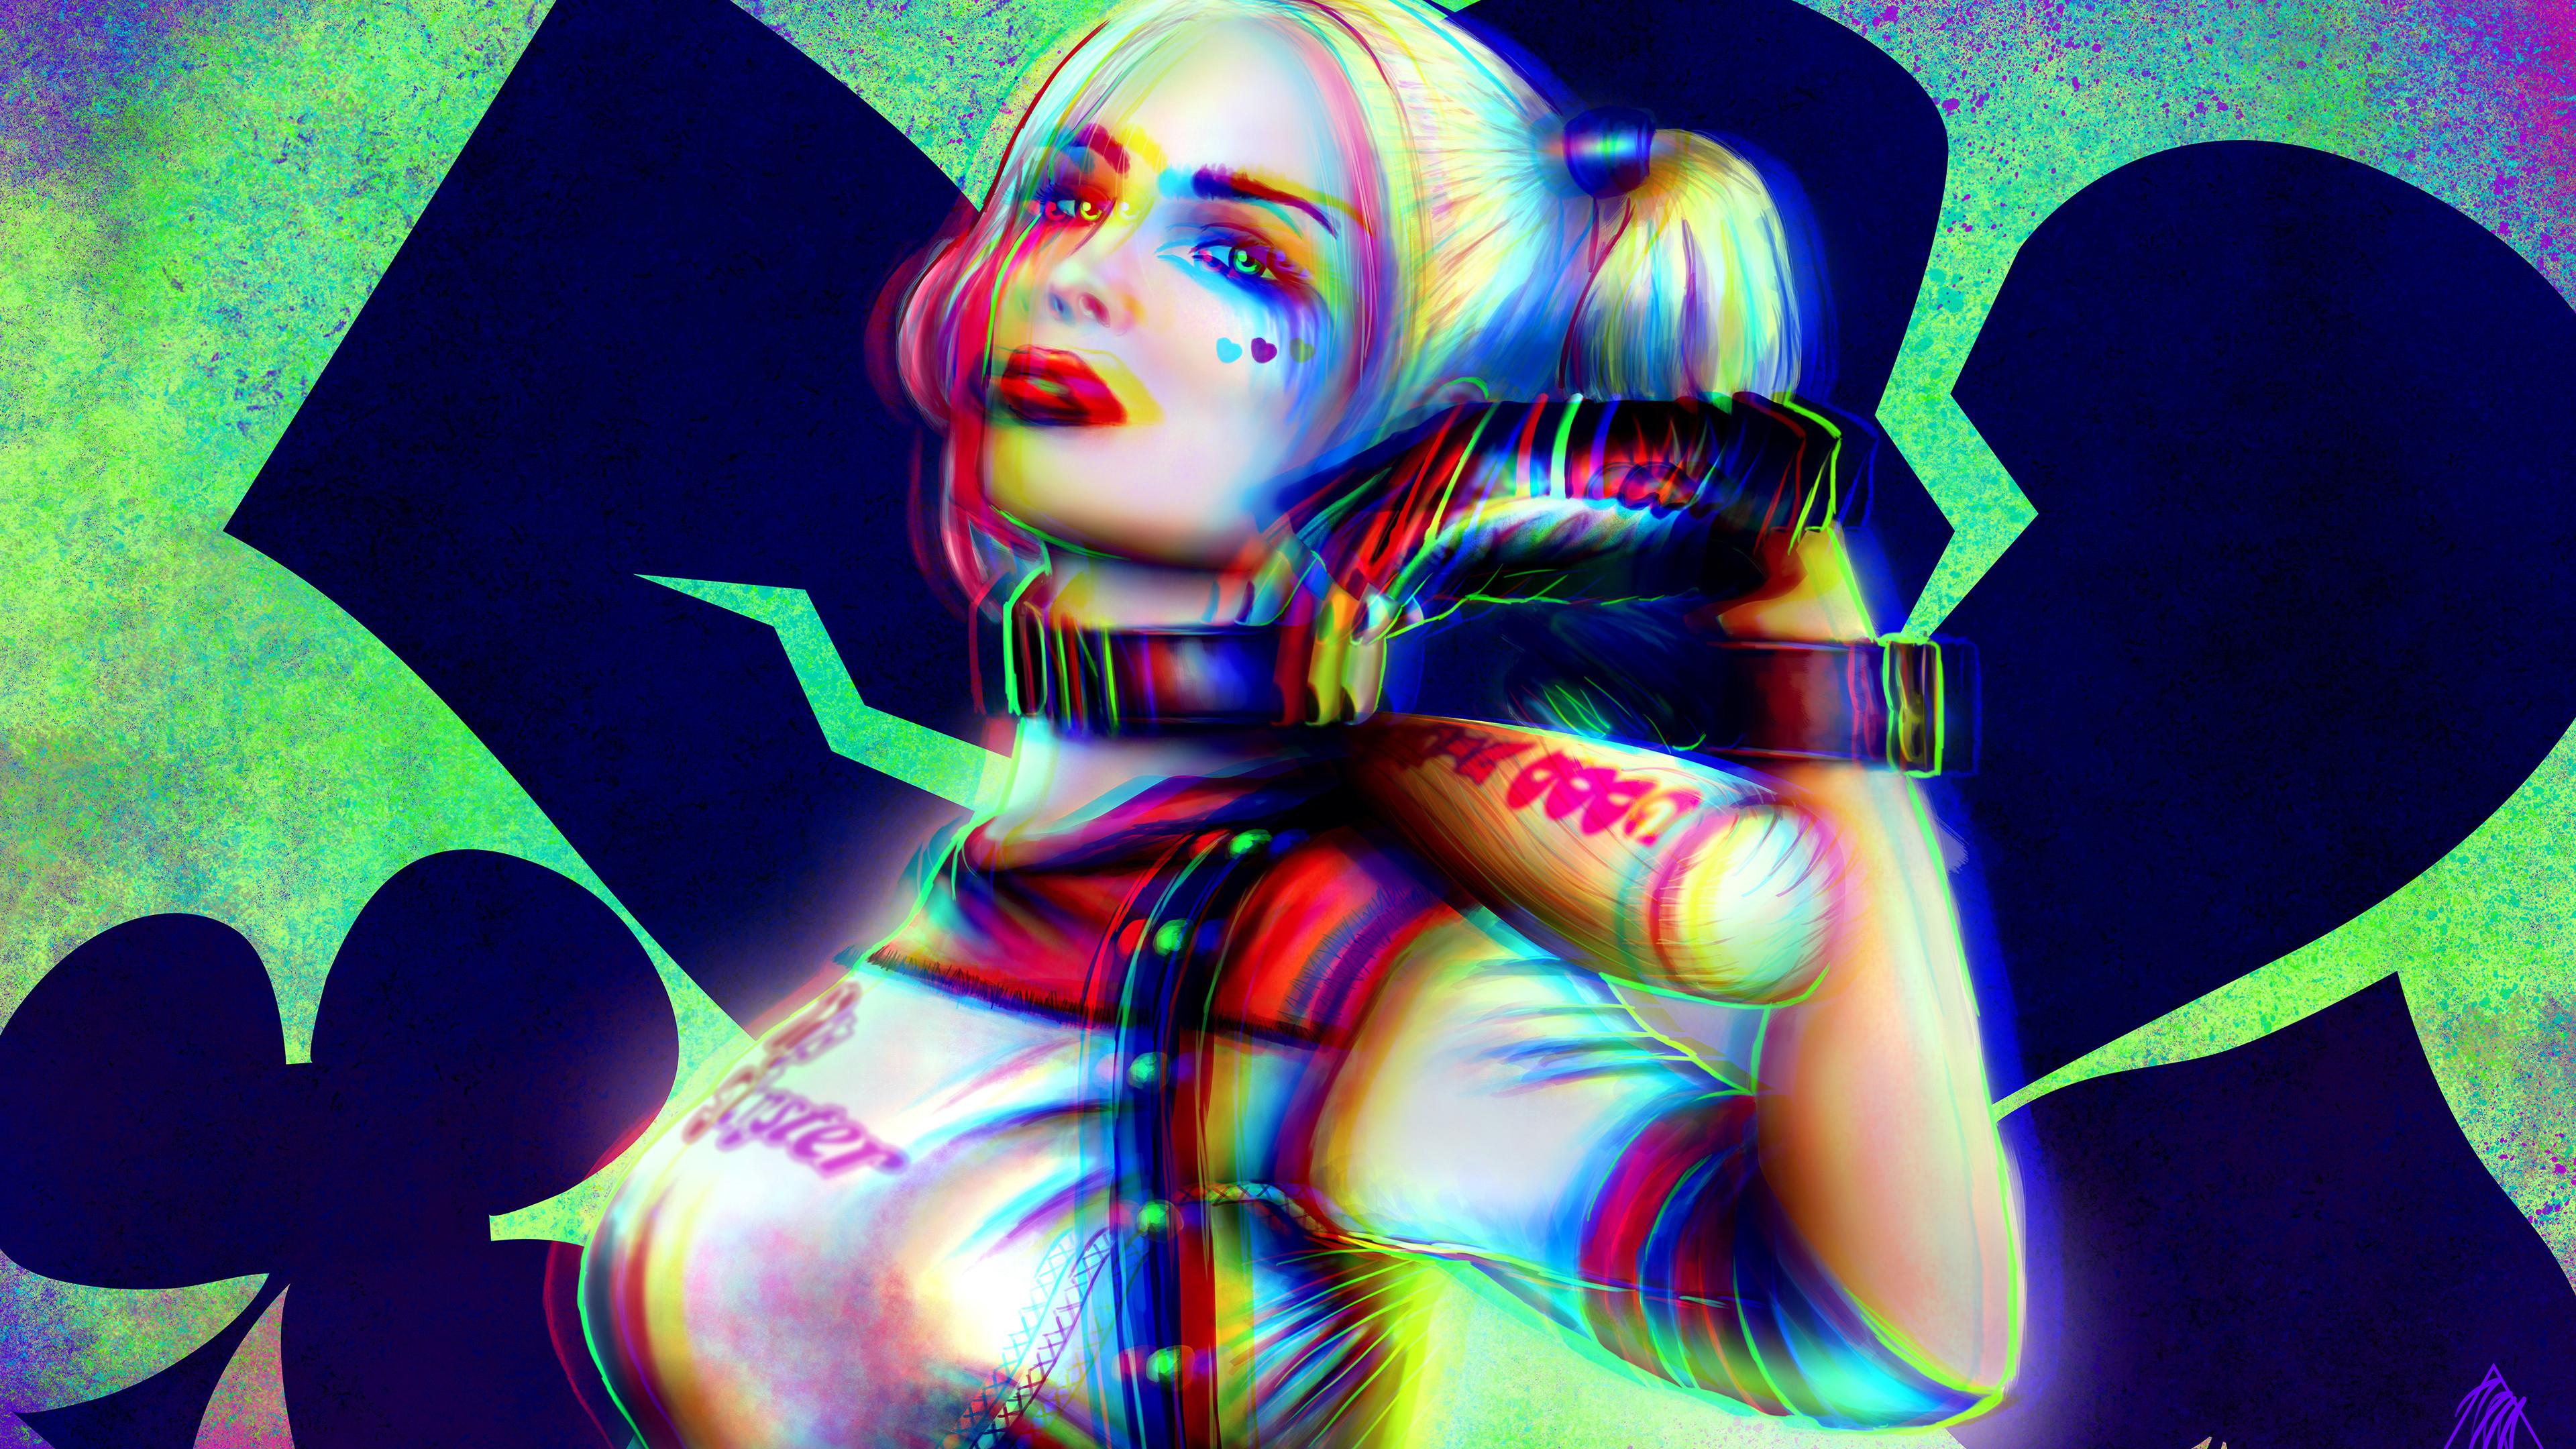 76 Wallpaper Hp Harley Quinn HD